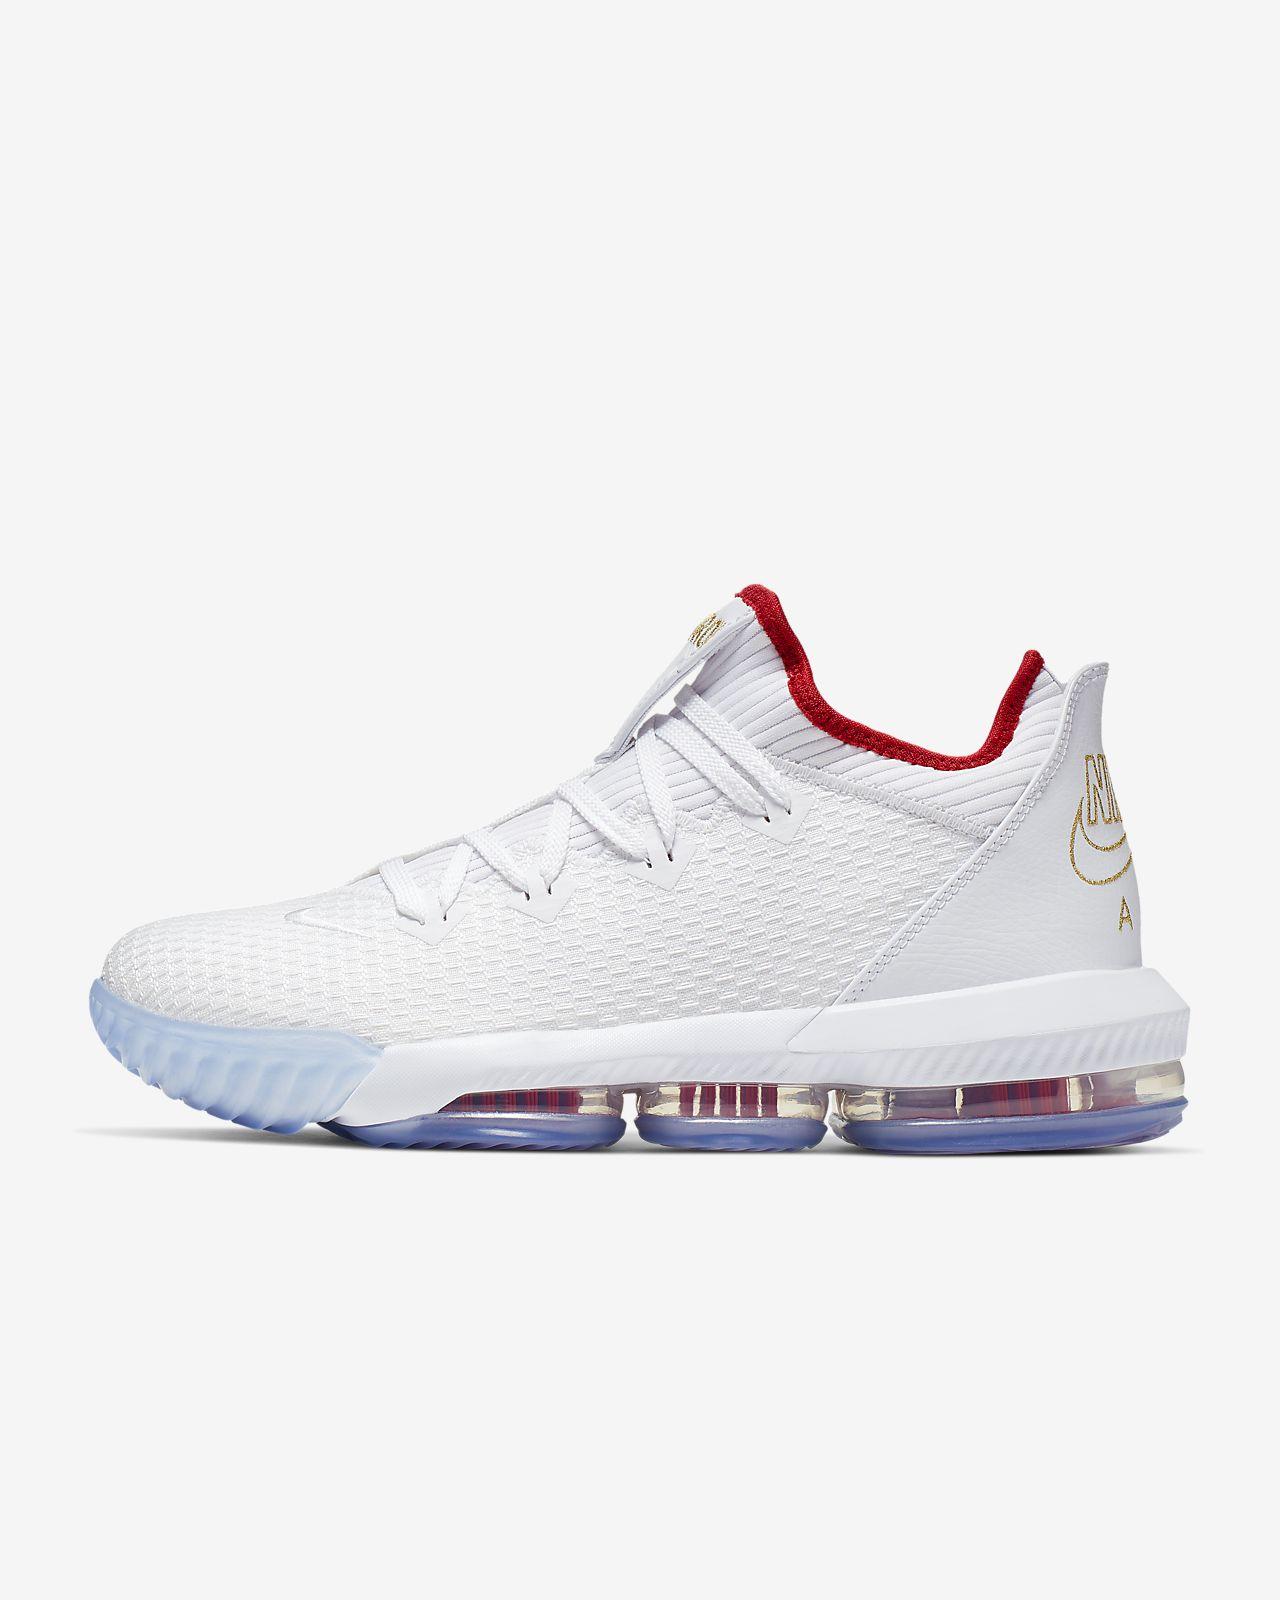 watch ce0d7 85c74 ... LeBron 16 Low Basketball Shoe